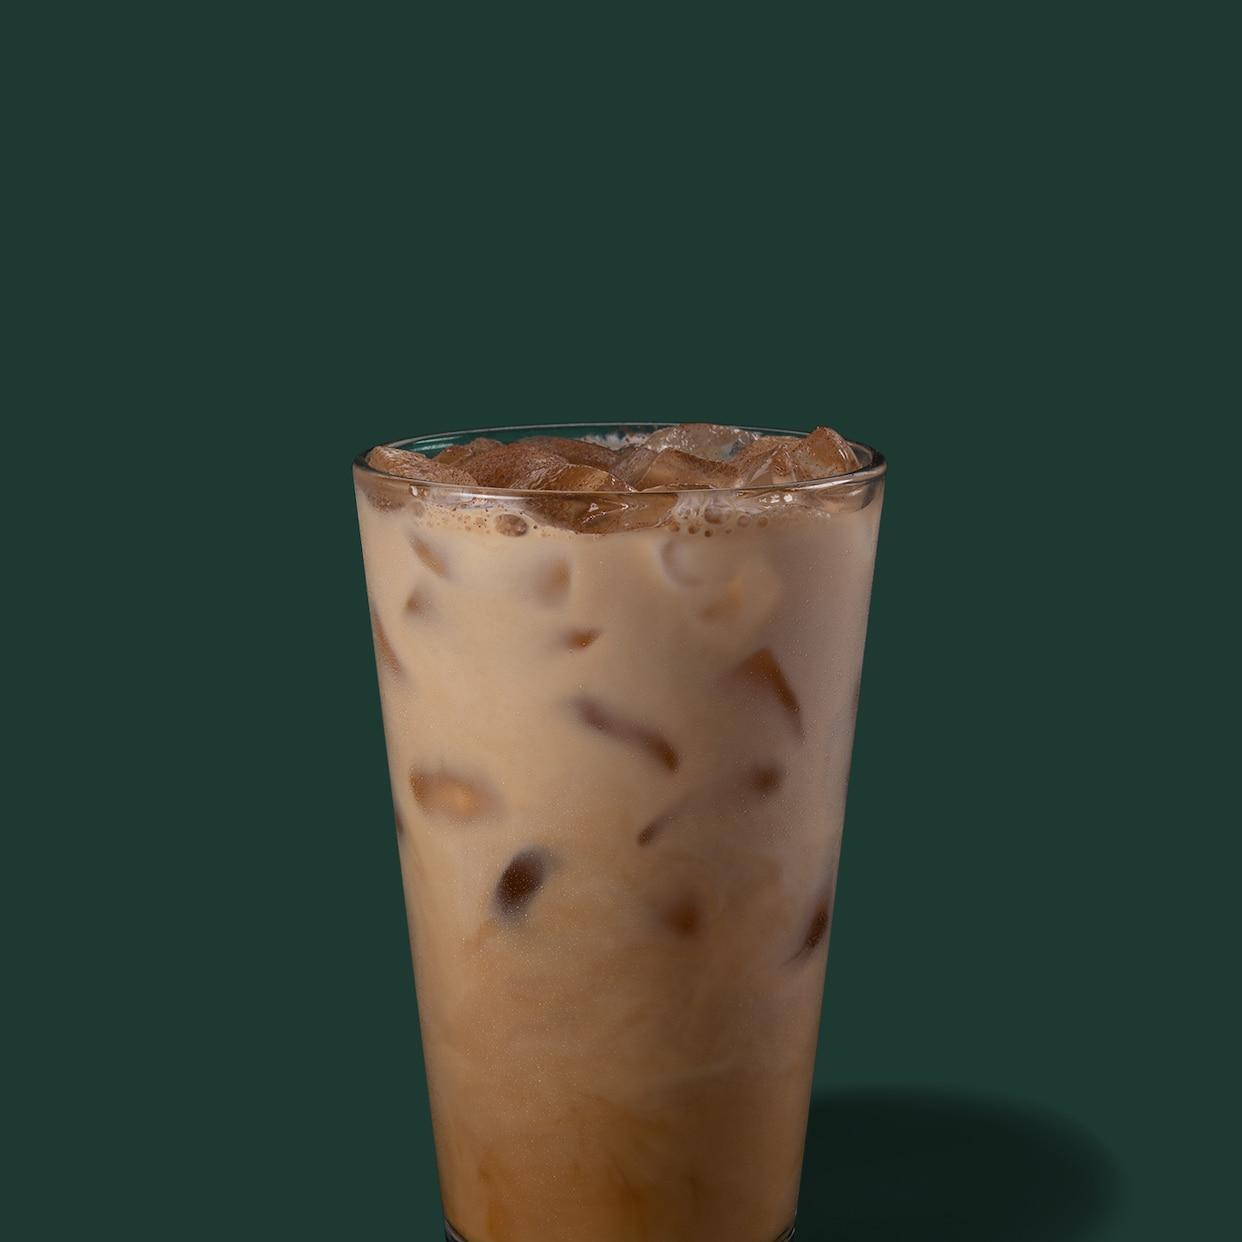 Iced Skinny Cinnamon Dolce Latte Starbucks Coffee Company